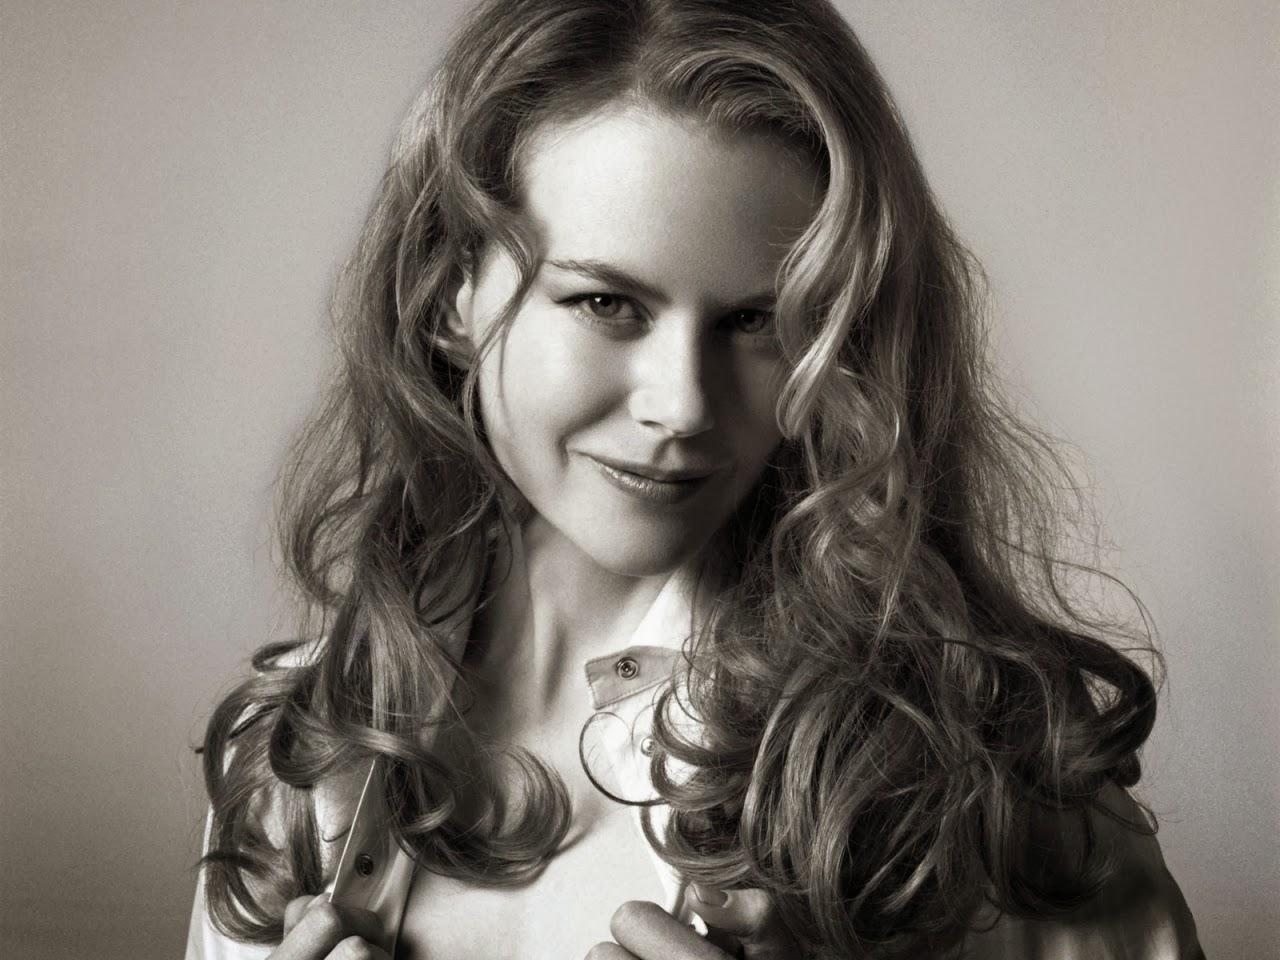 Nicole Kidman Hd Wallpapers Free Download